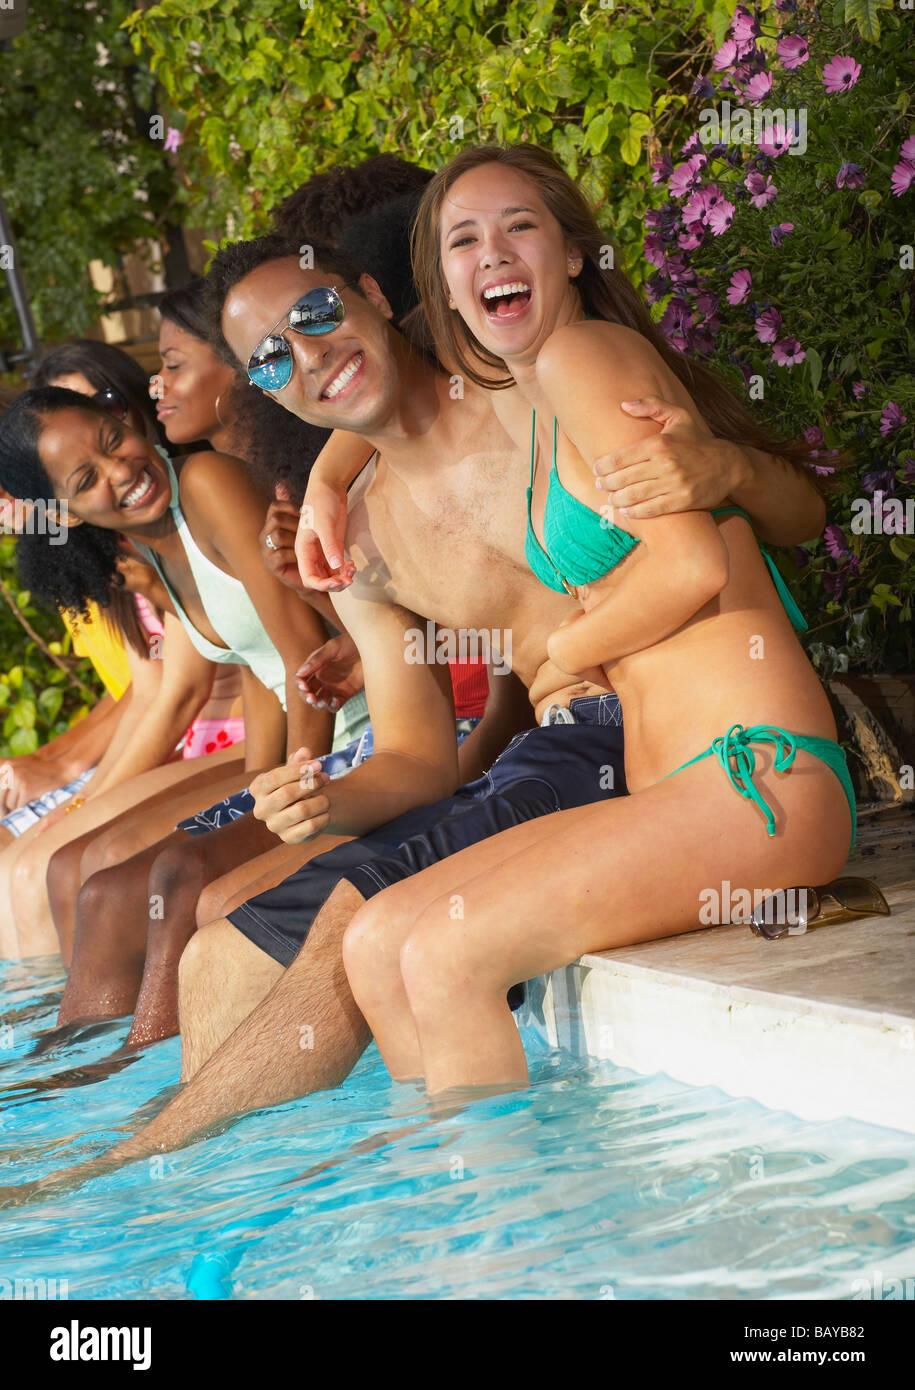 Poolparty klamotten